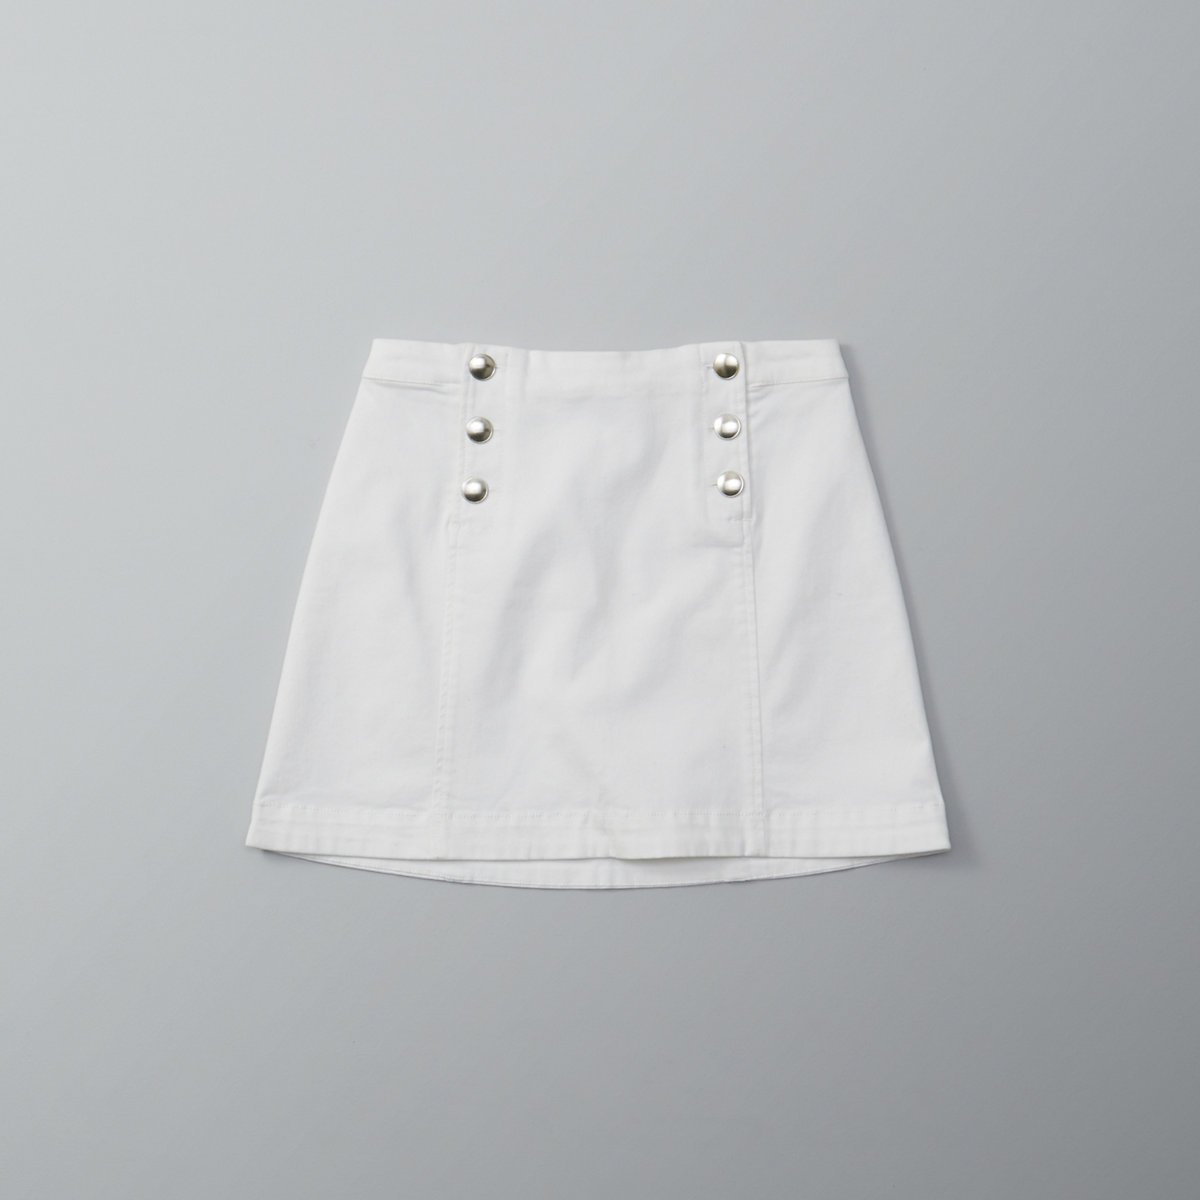 Nautical A-Line Skirt